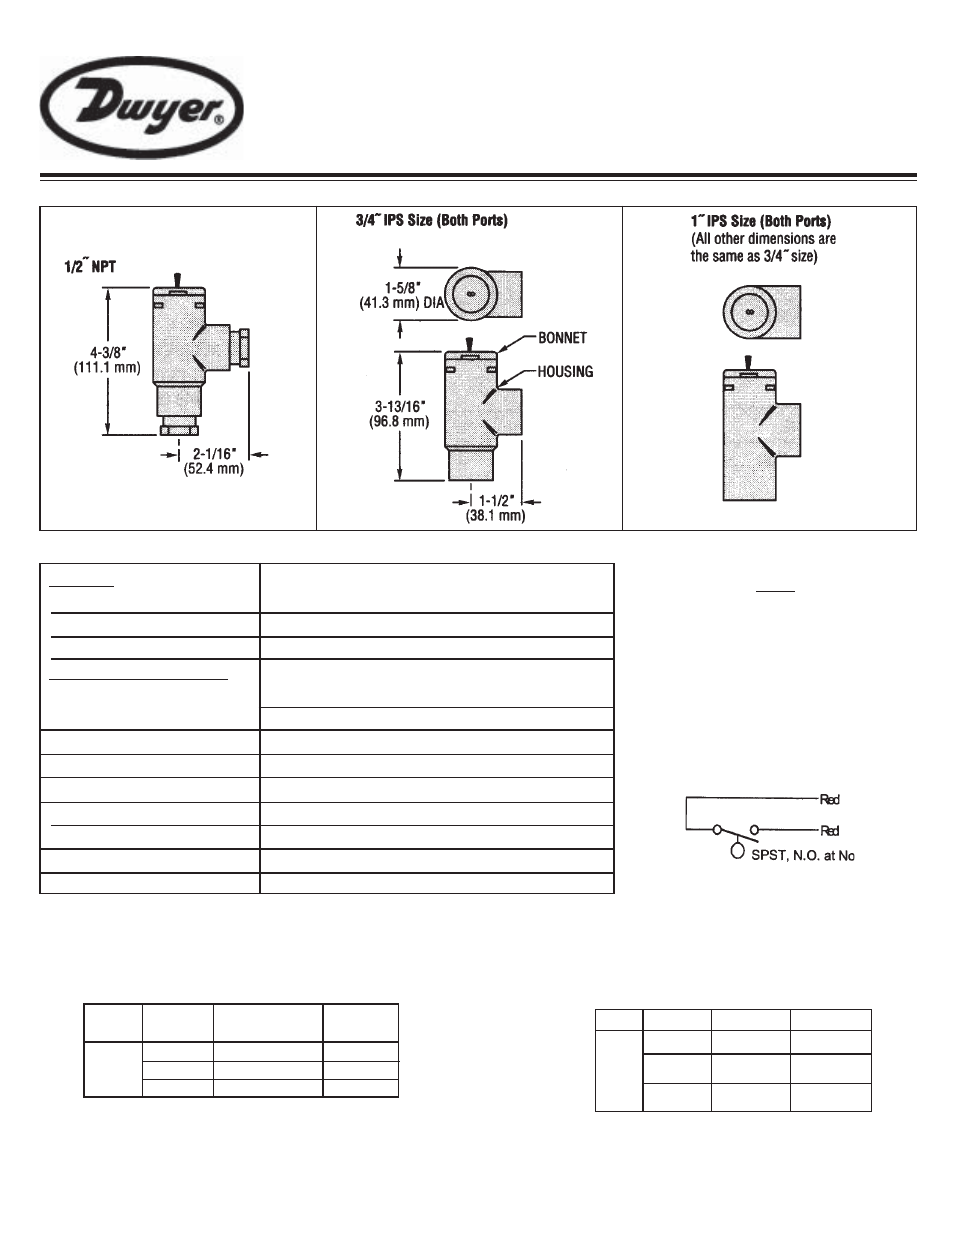 medium resolution of  dwyer p5 user manual 2 pages on 240v single phase diagram 120 240v transformer v flow switch wiring